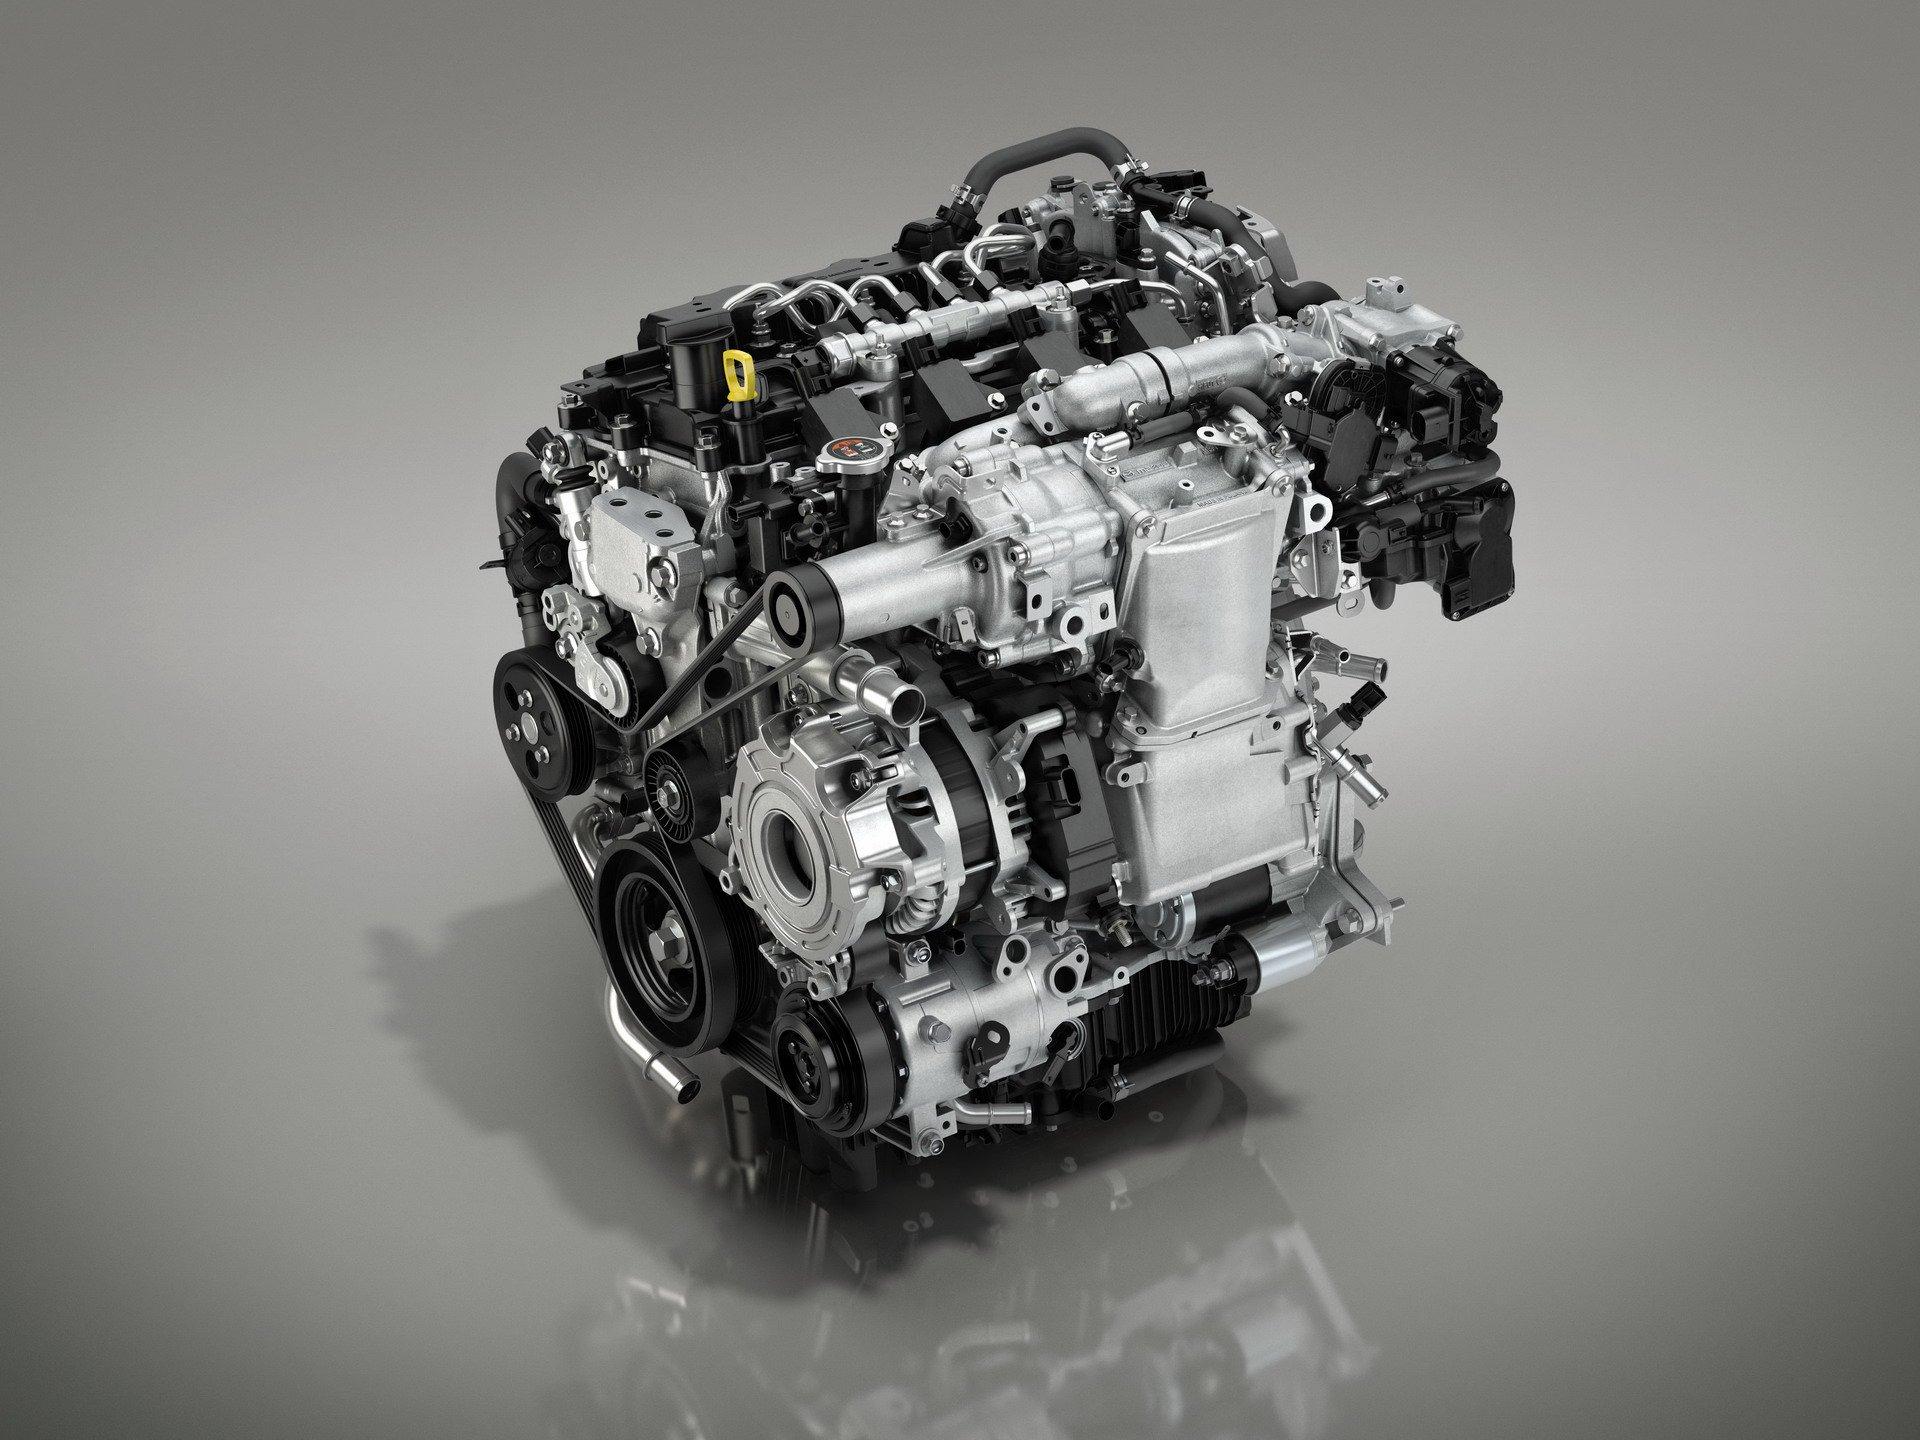 2019-mazda-3-sedan-hatch-16.jpg